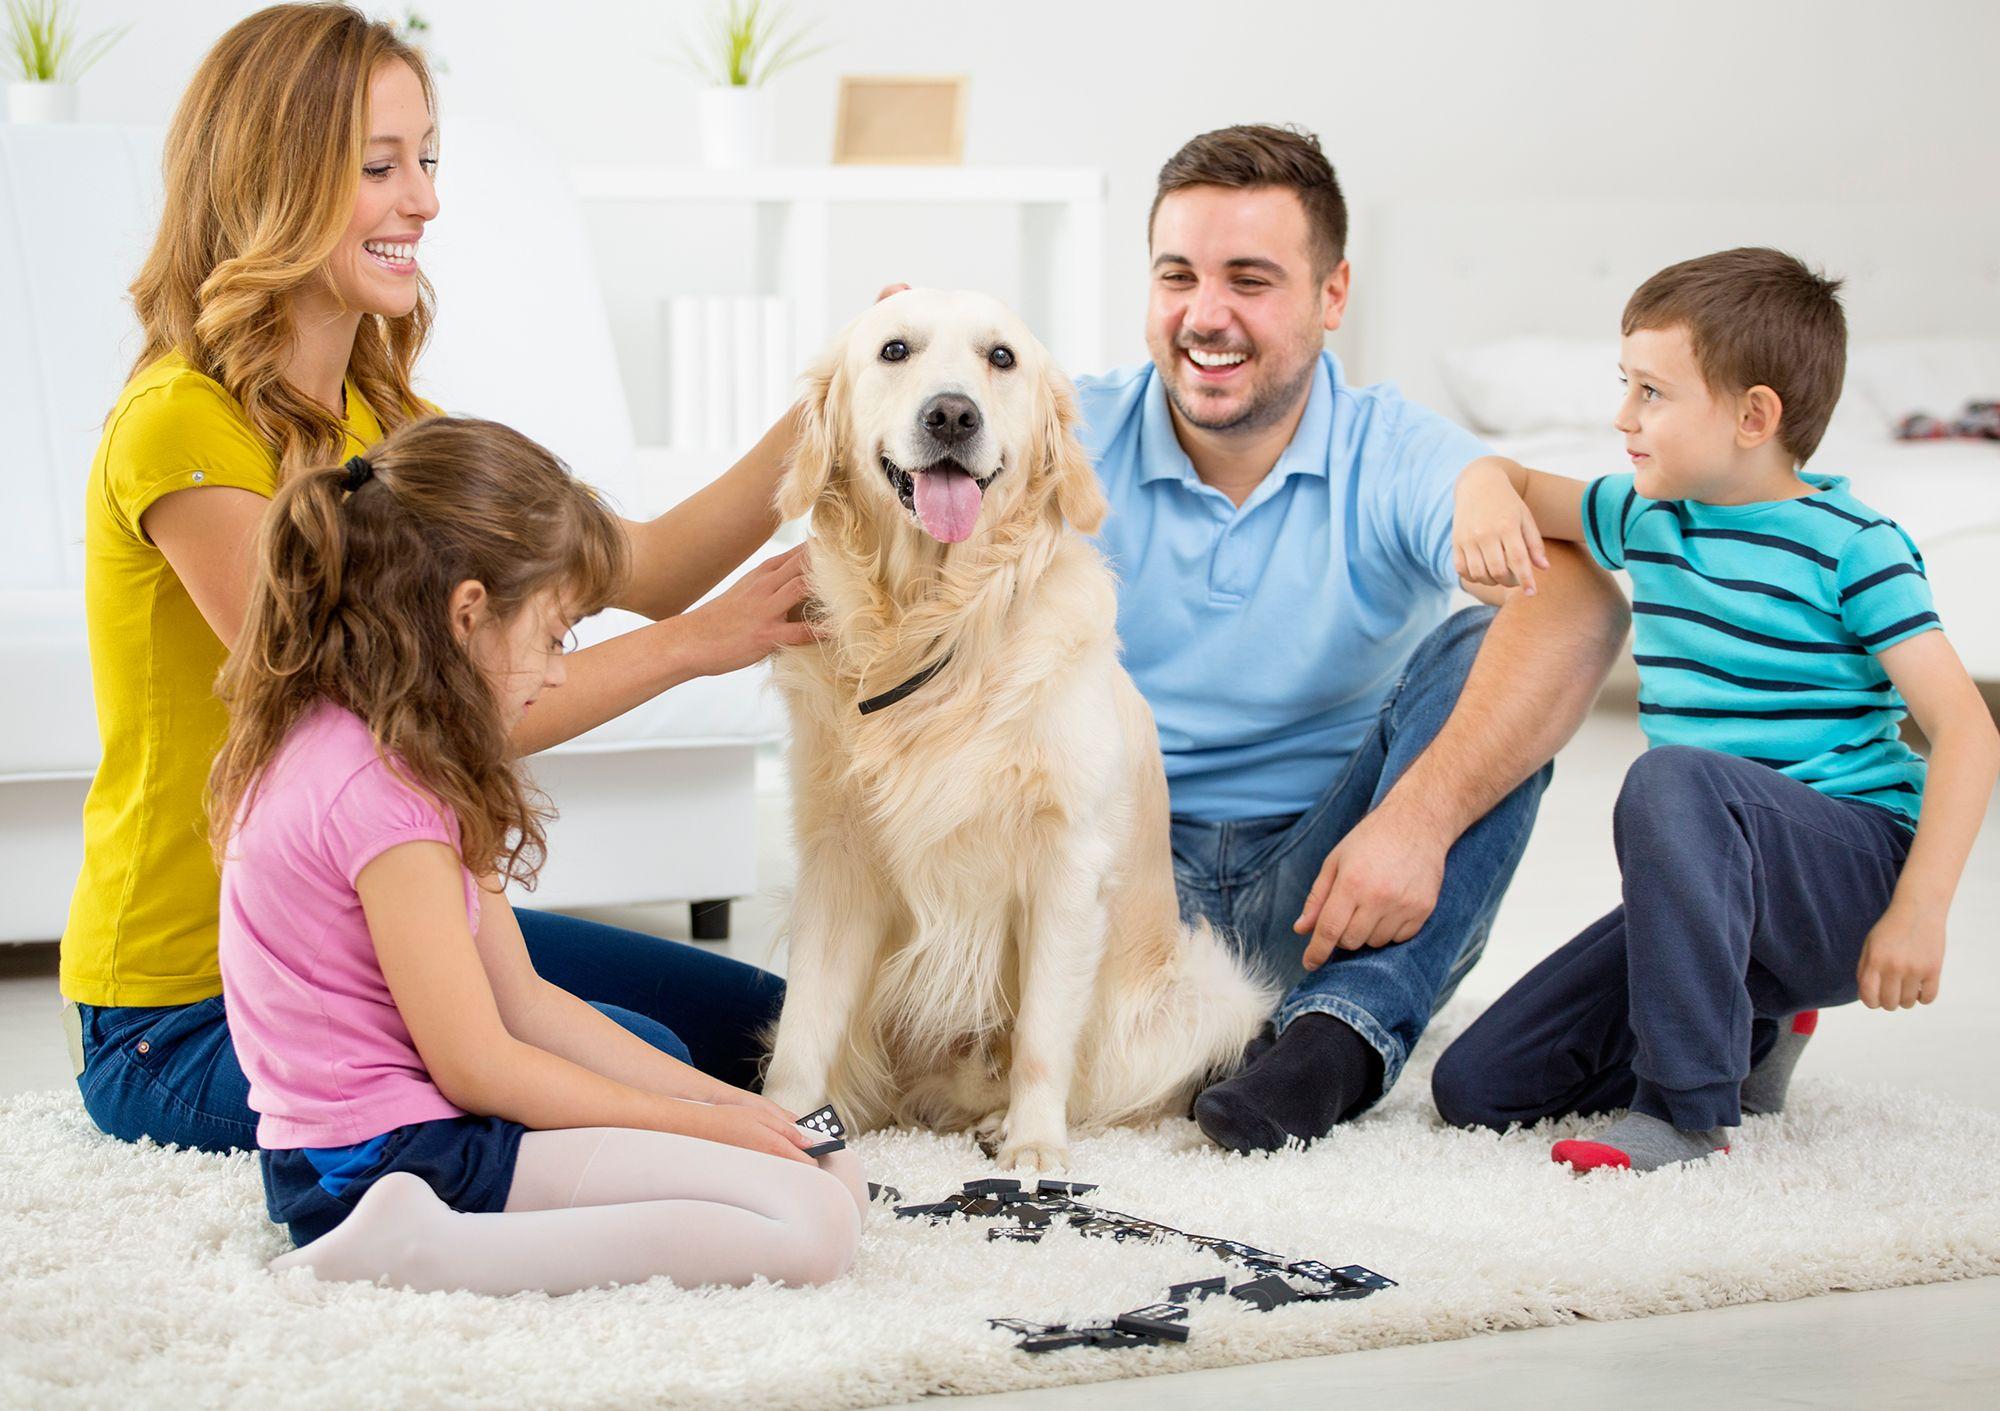 preparar llegada perro - consenso